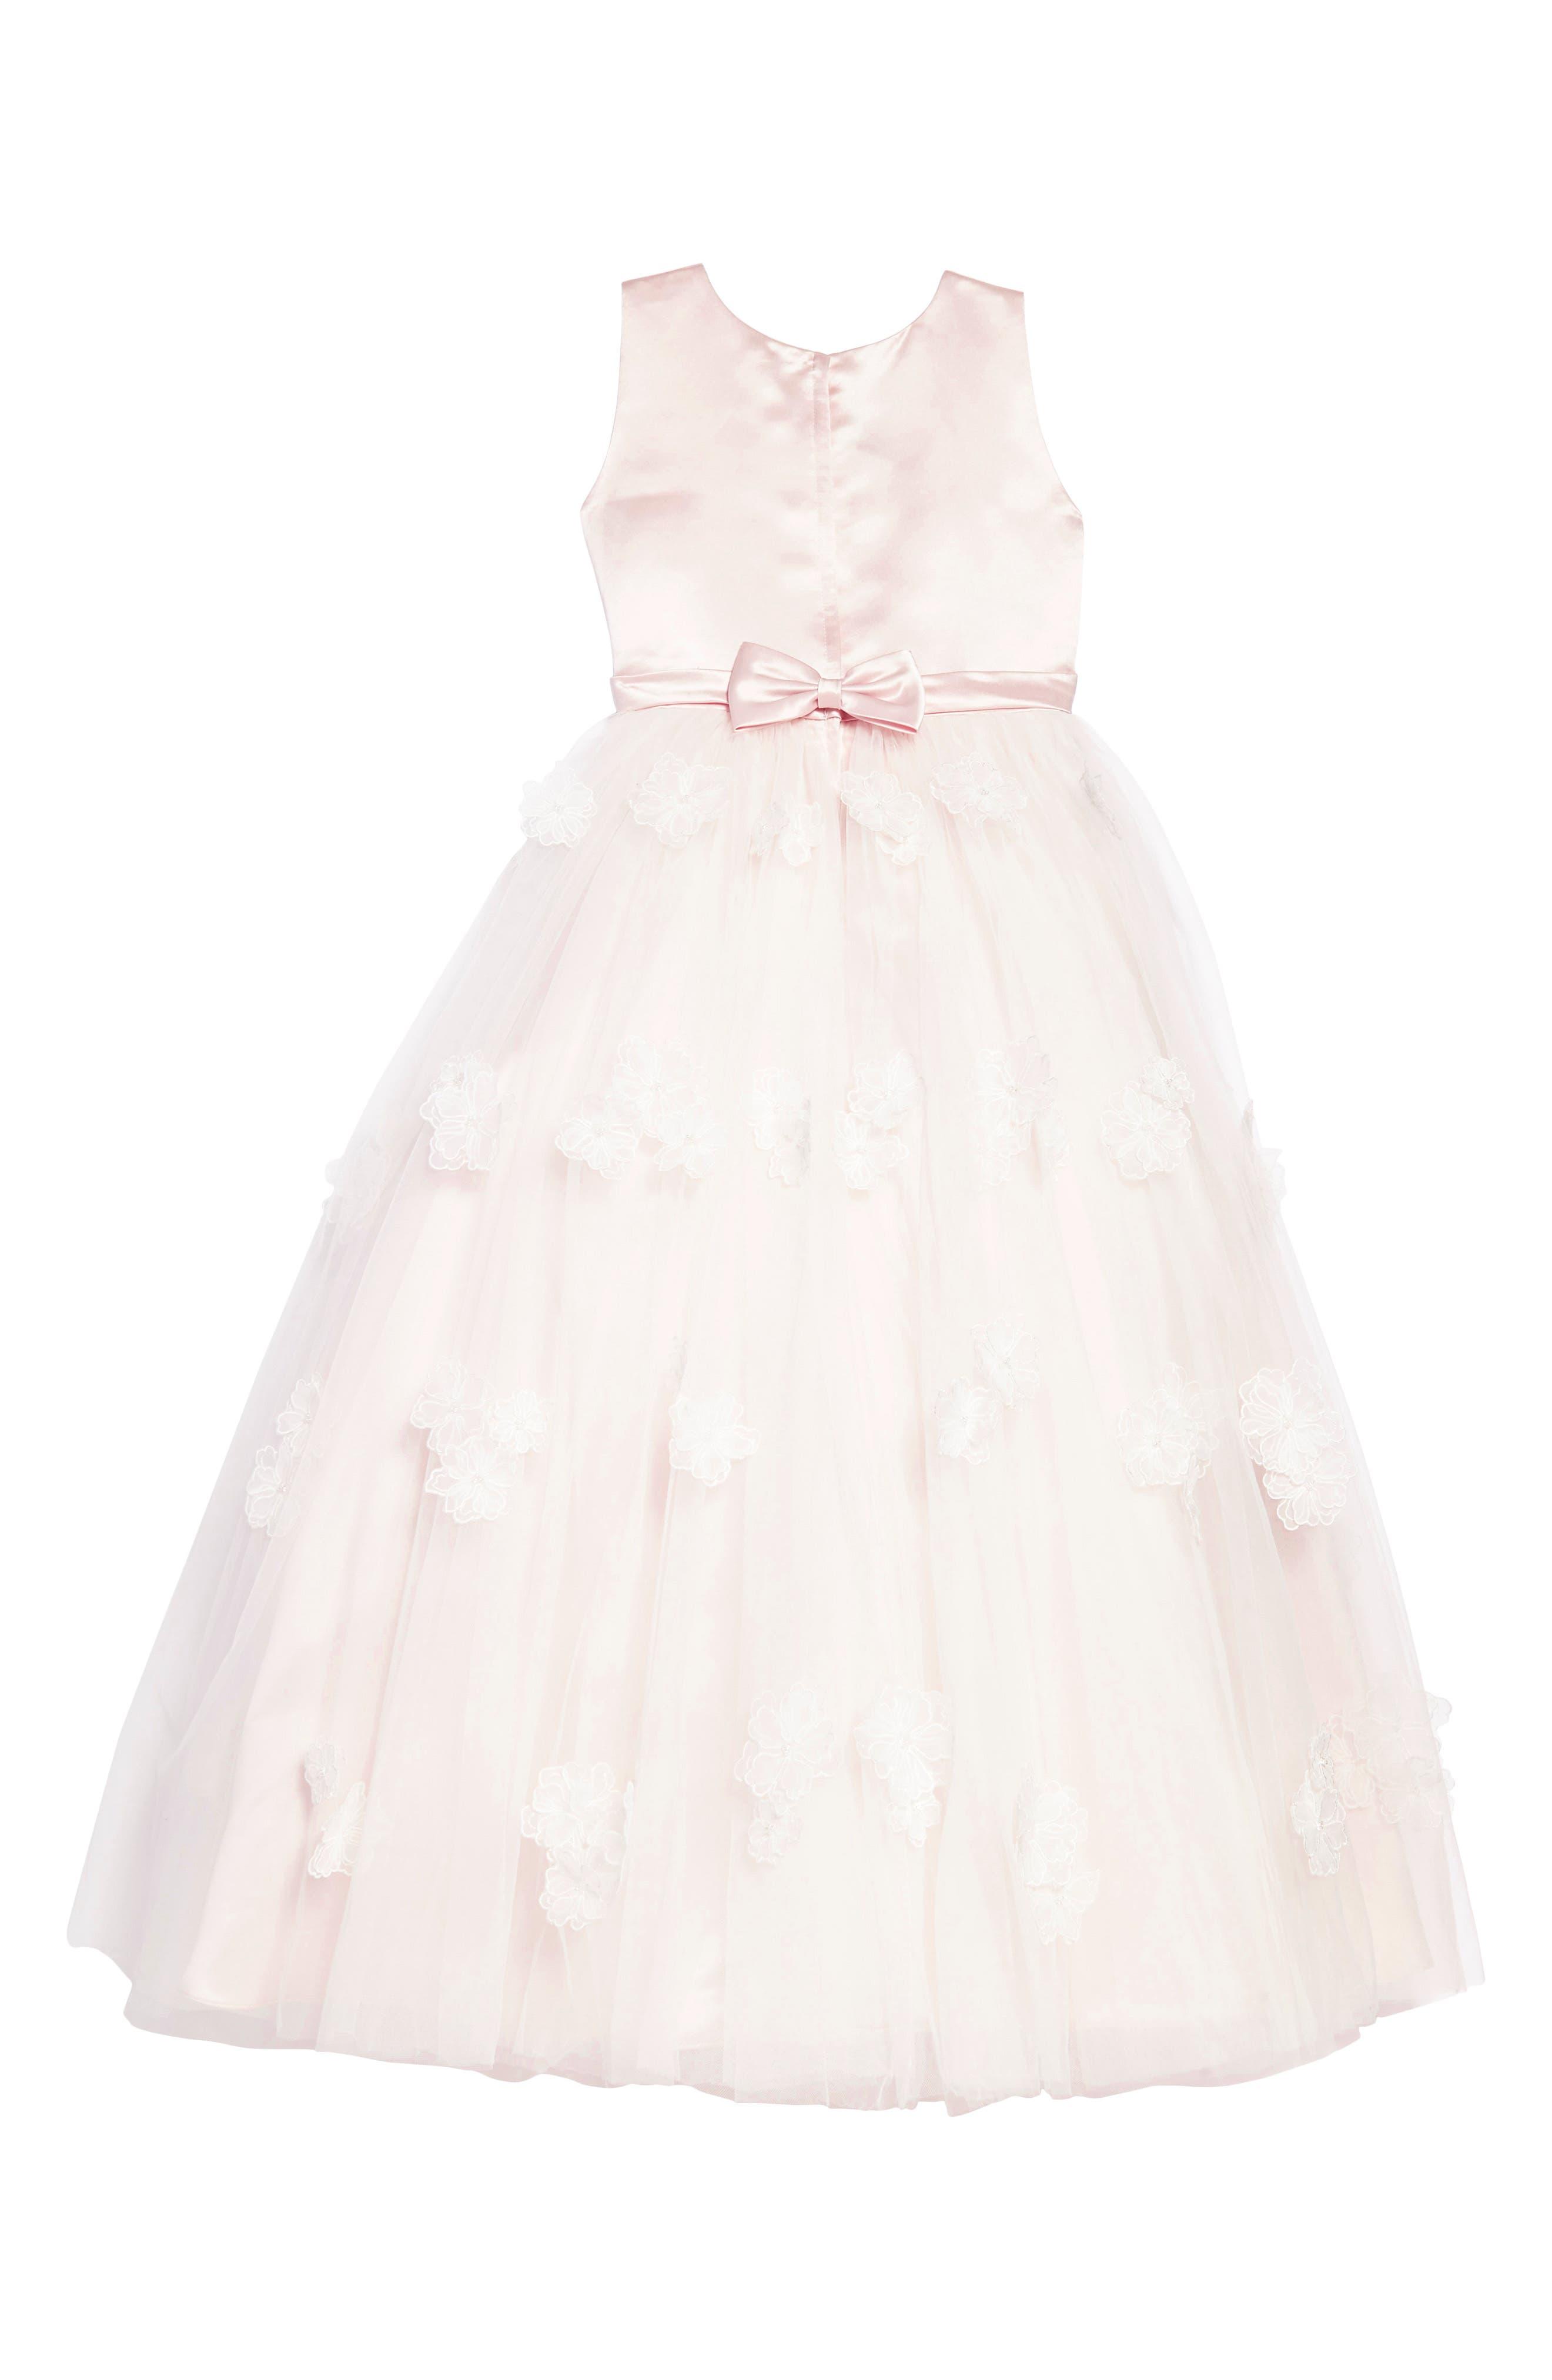 Satin & Tulle Dress,                             Alternate thumbnail 2, color,                             900